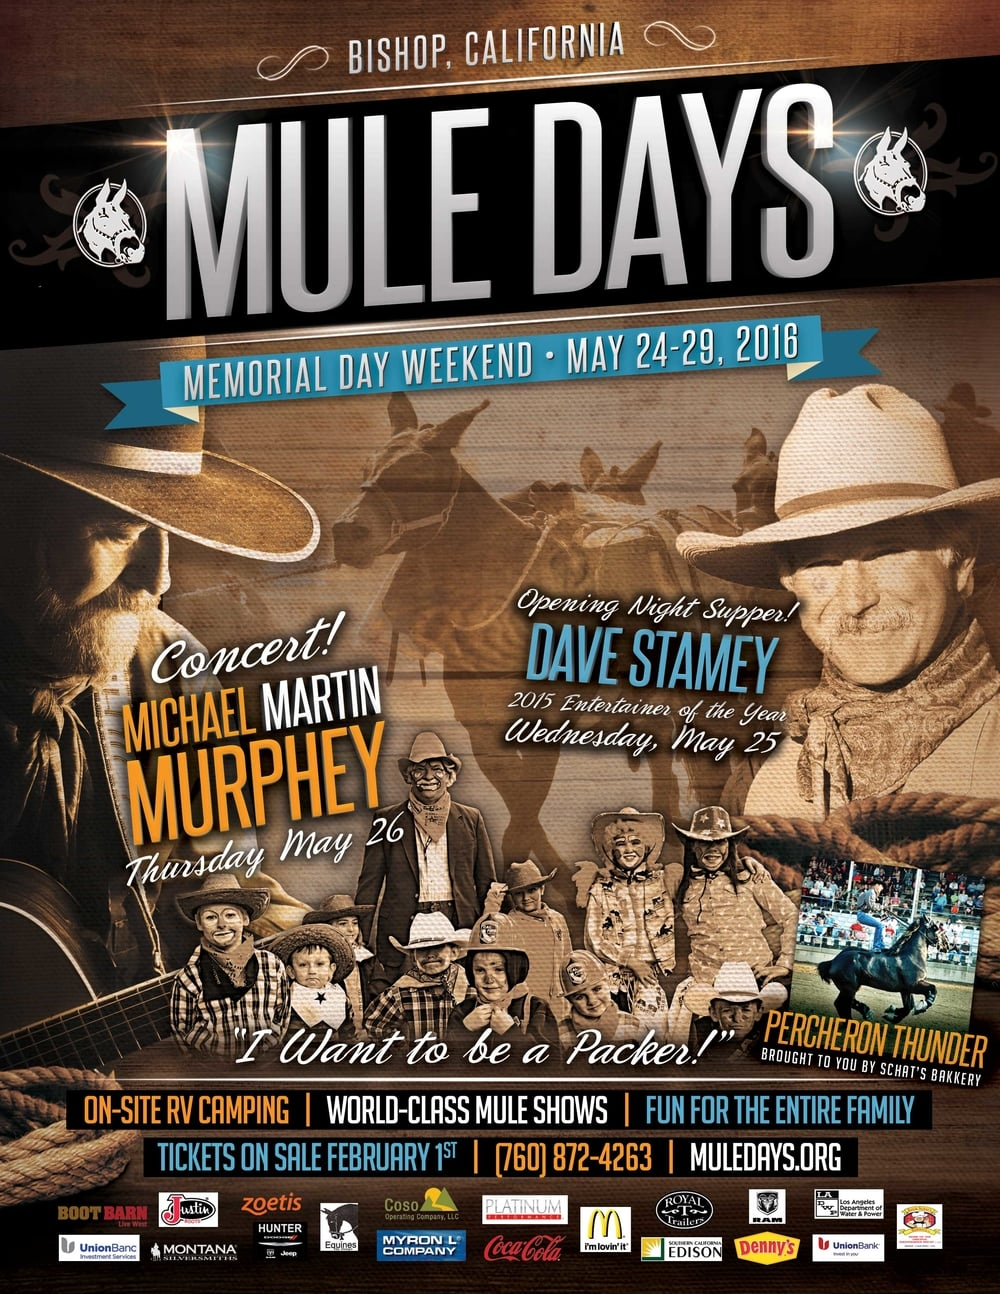 Mule Days 2016